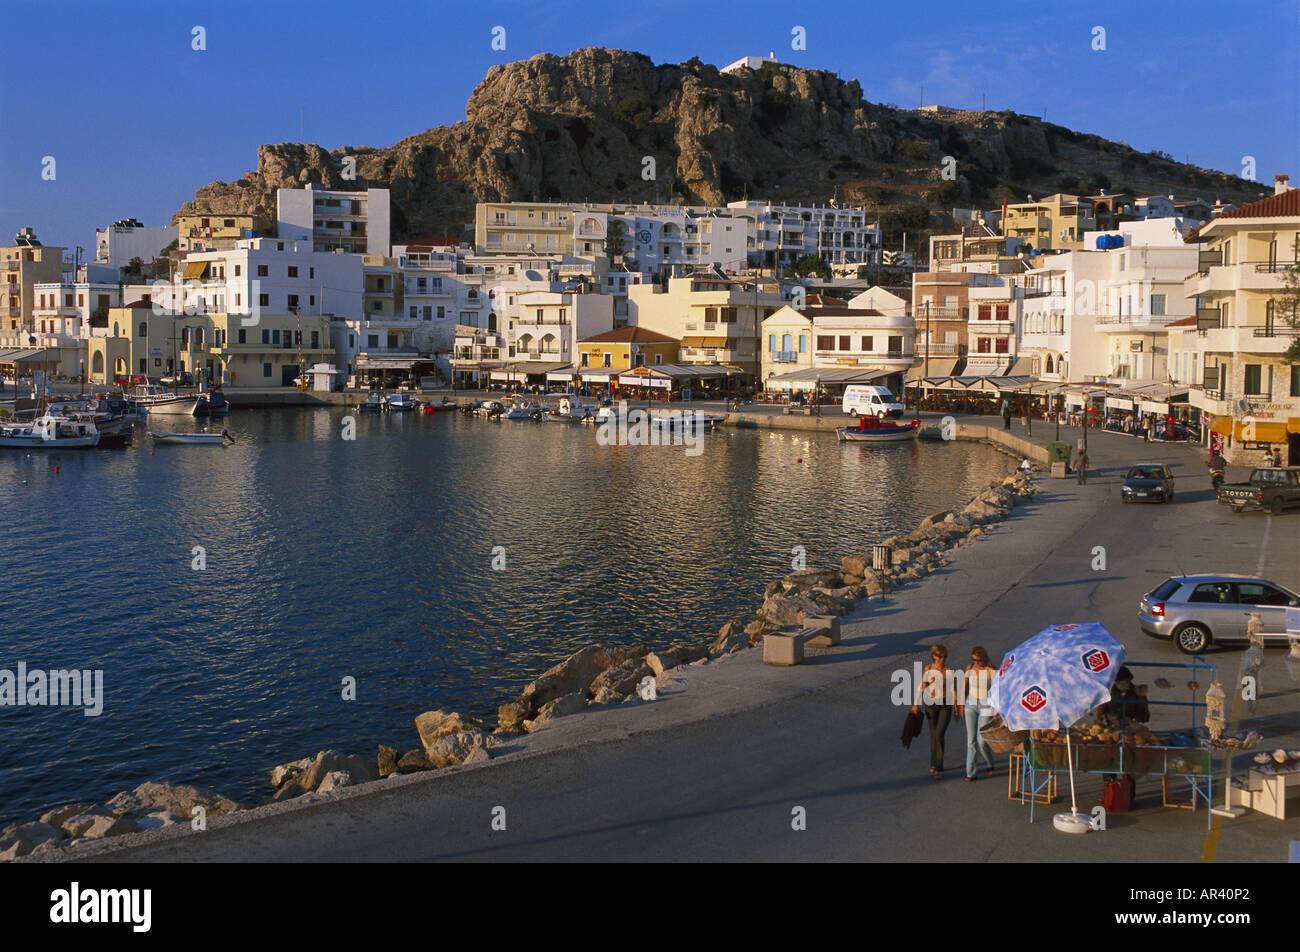 Vronthi Bay, Pigadia, Scarpanto, Dodecanese, Greece Stock Photo